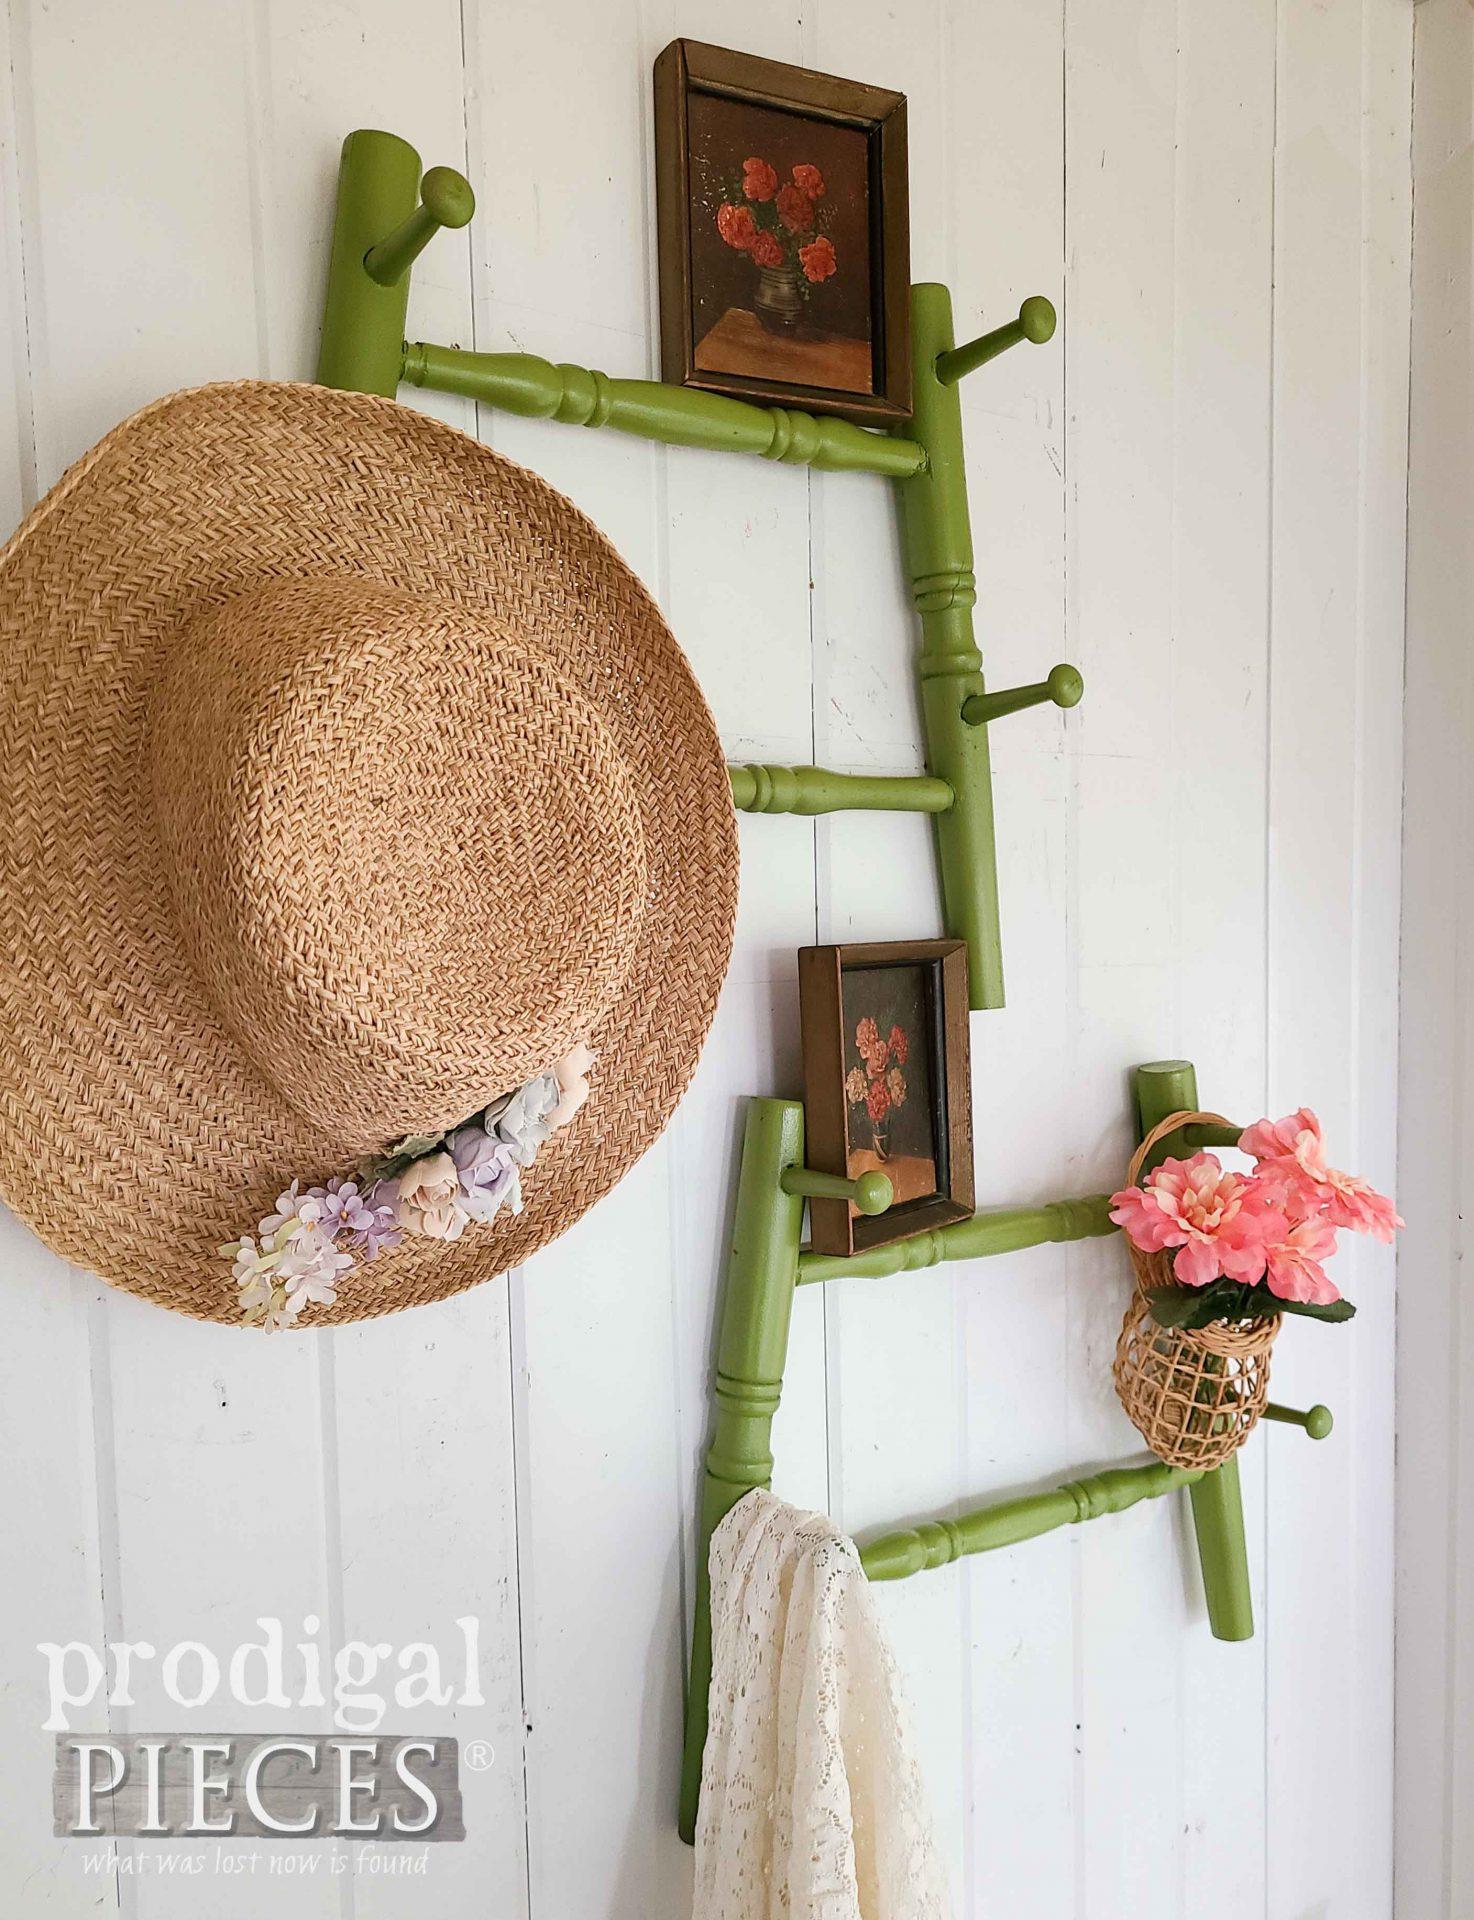 Reclaimed Bar Stool Coat Racks by Larissa of Prodigal Pieces   prodigalpieces.com #prodigalpieces #reclaimed #diy #home #furntiure